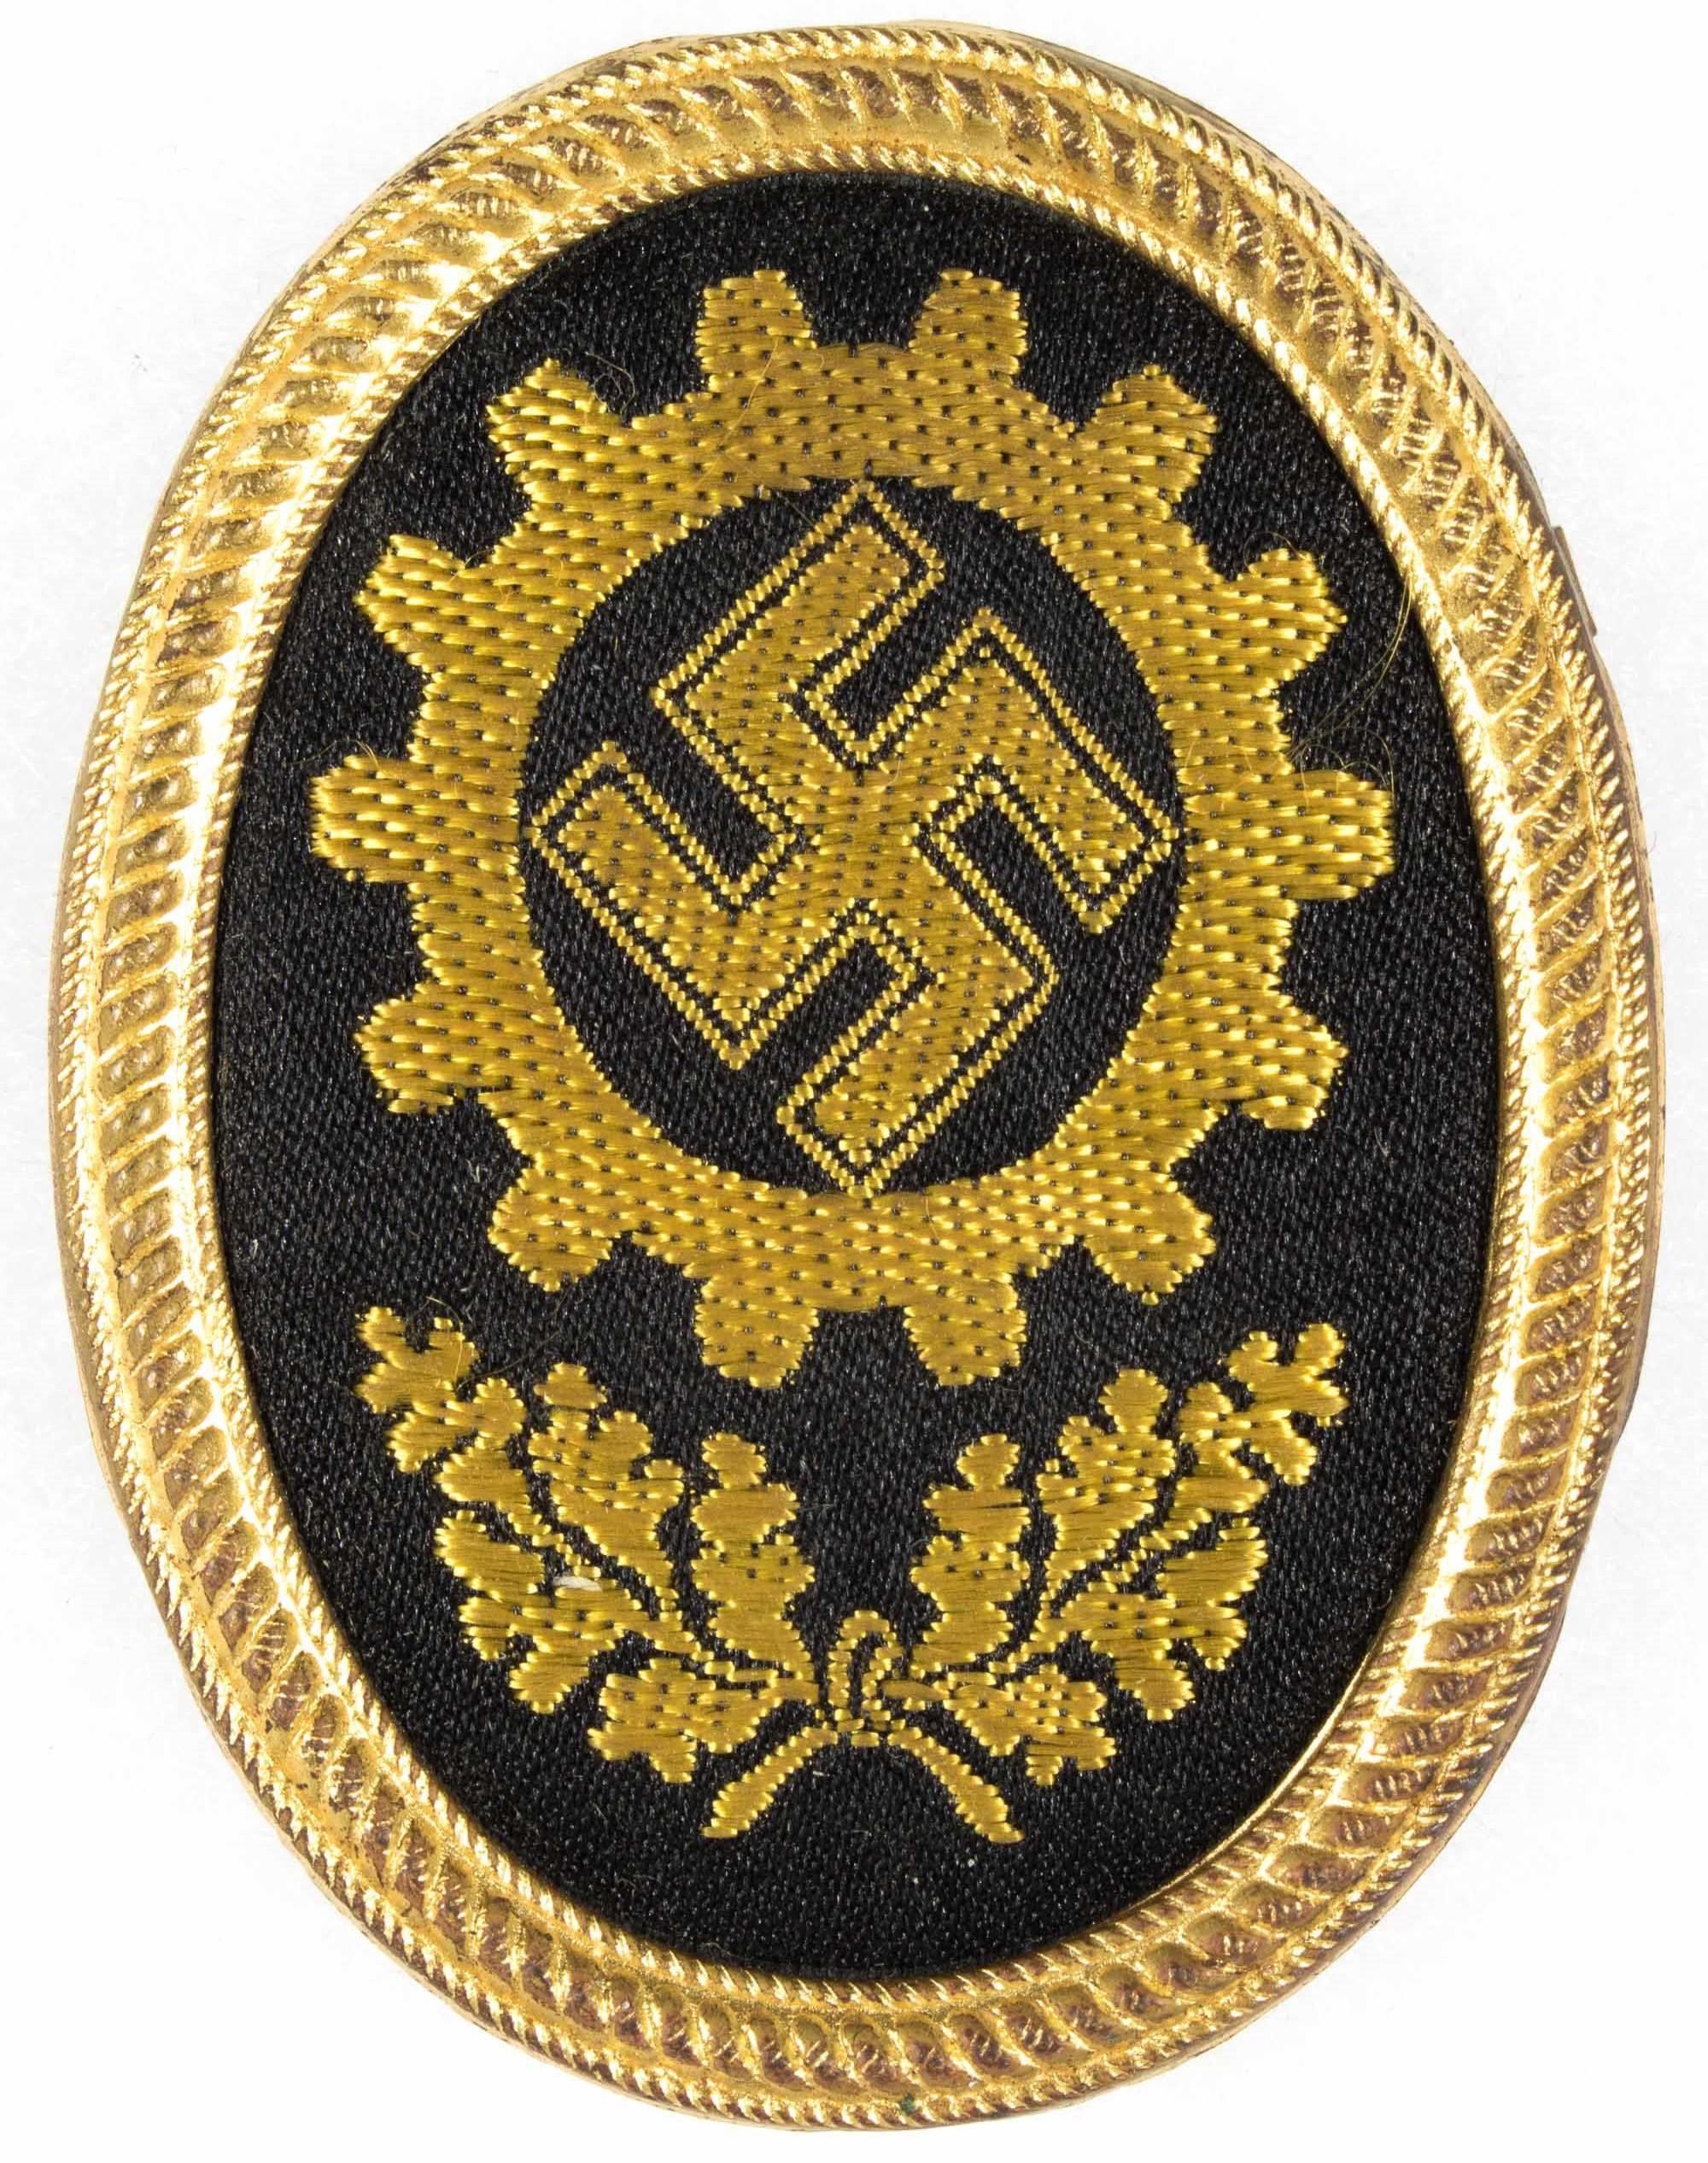 GERMAN LABOR FRONT HAT BADGE